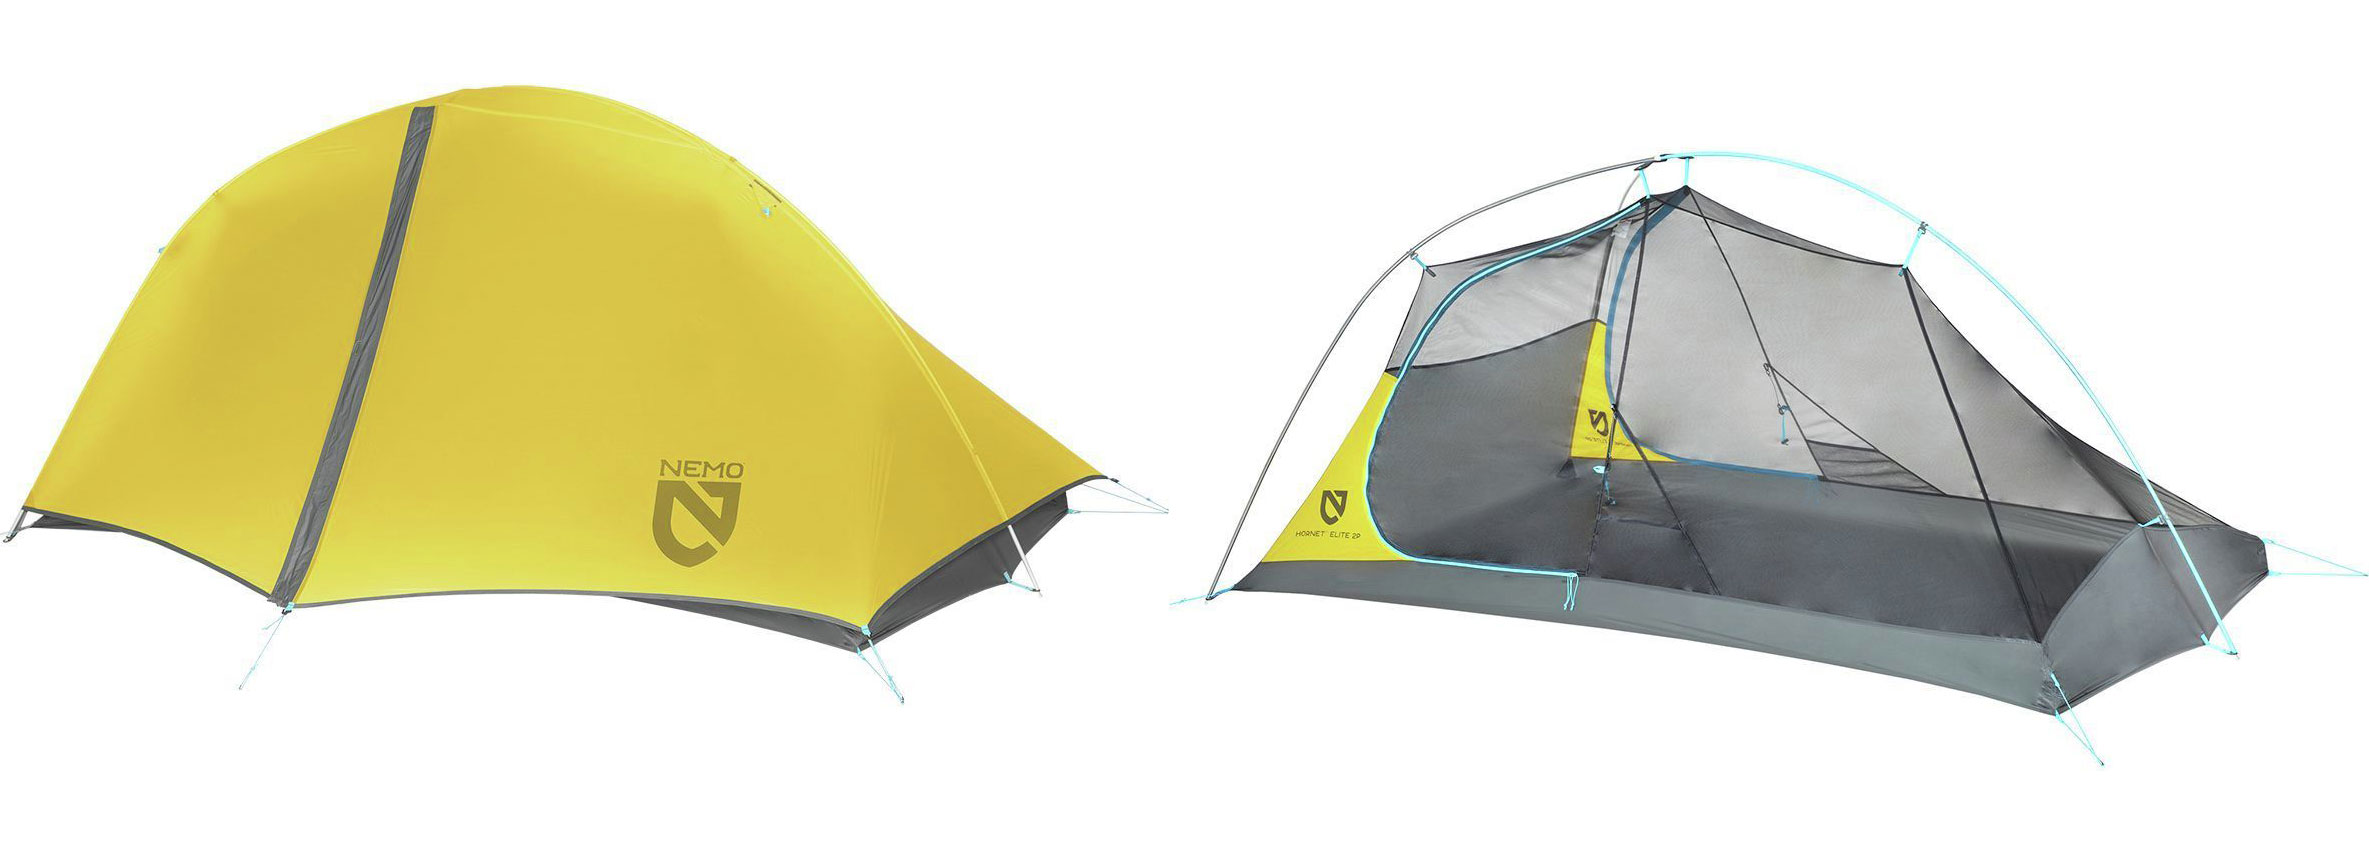 NEMO Hornet Elite Tent